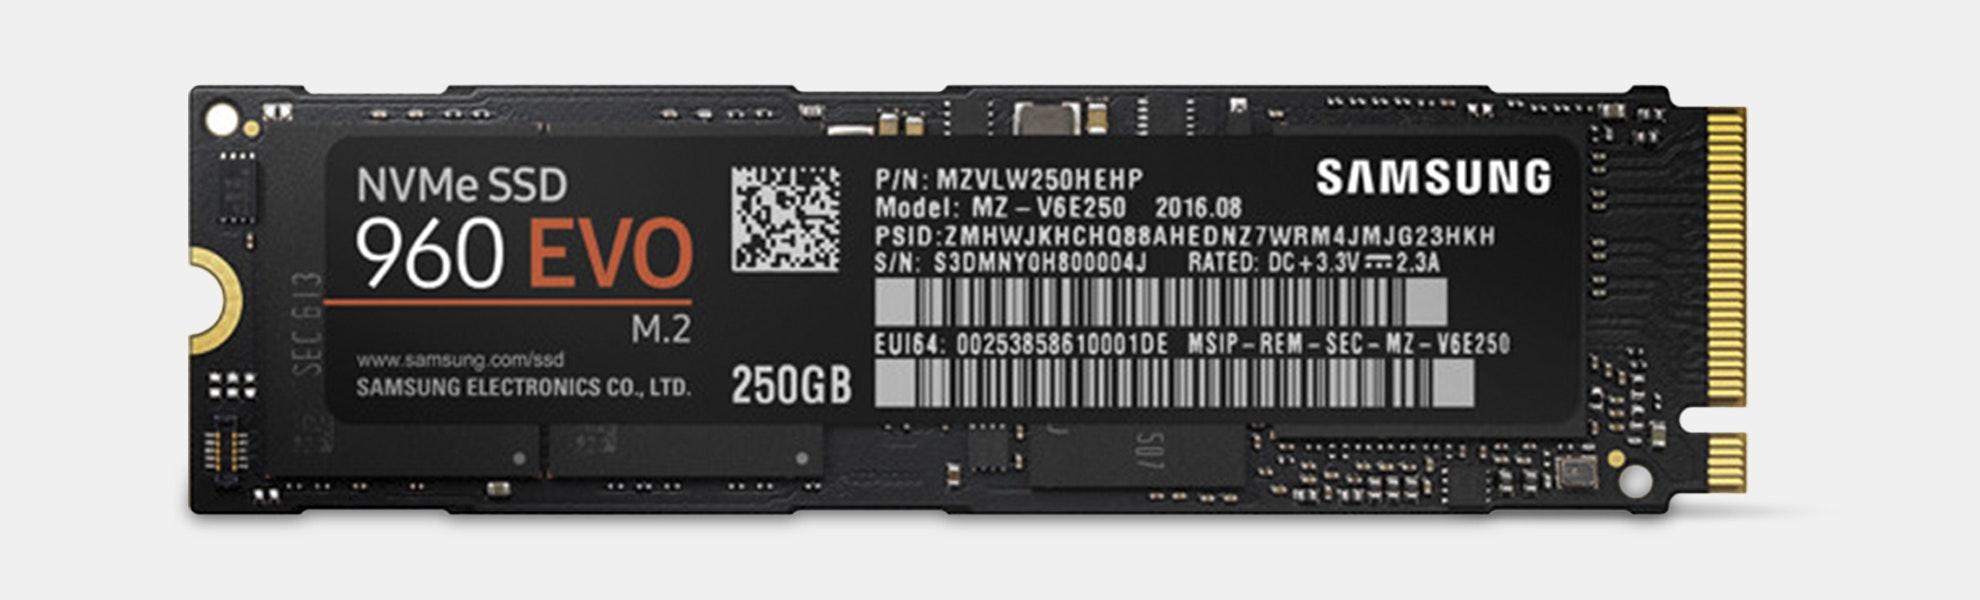 Samsung  960EVO NVMe M.2 SSD Drive